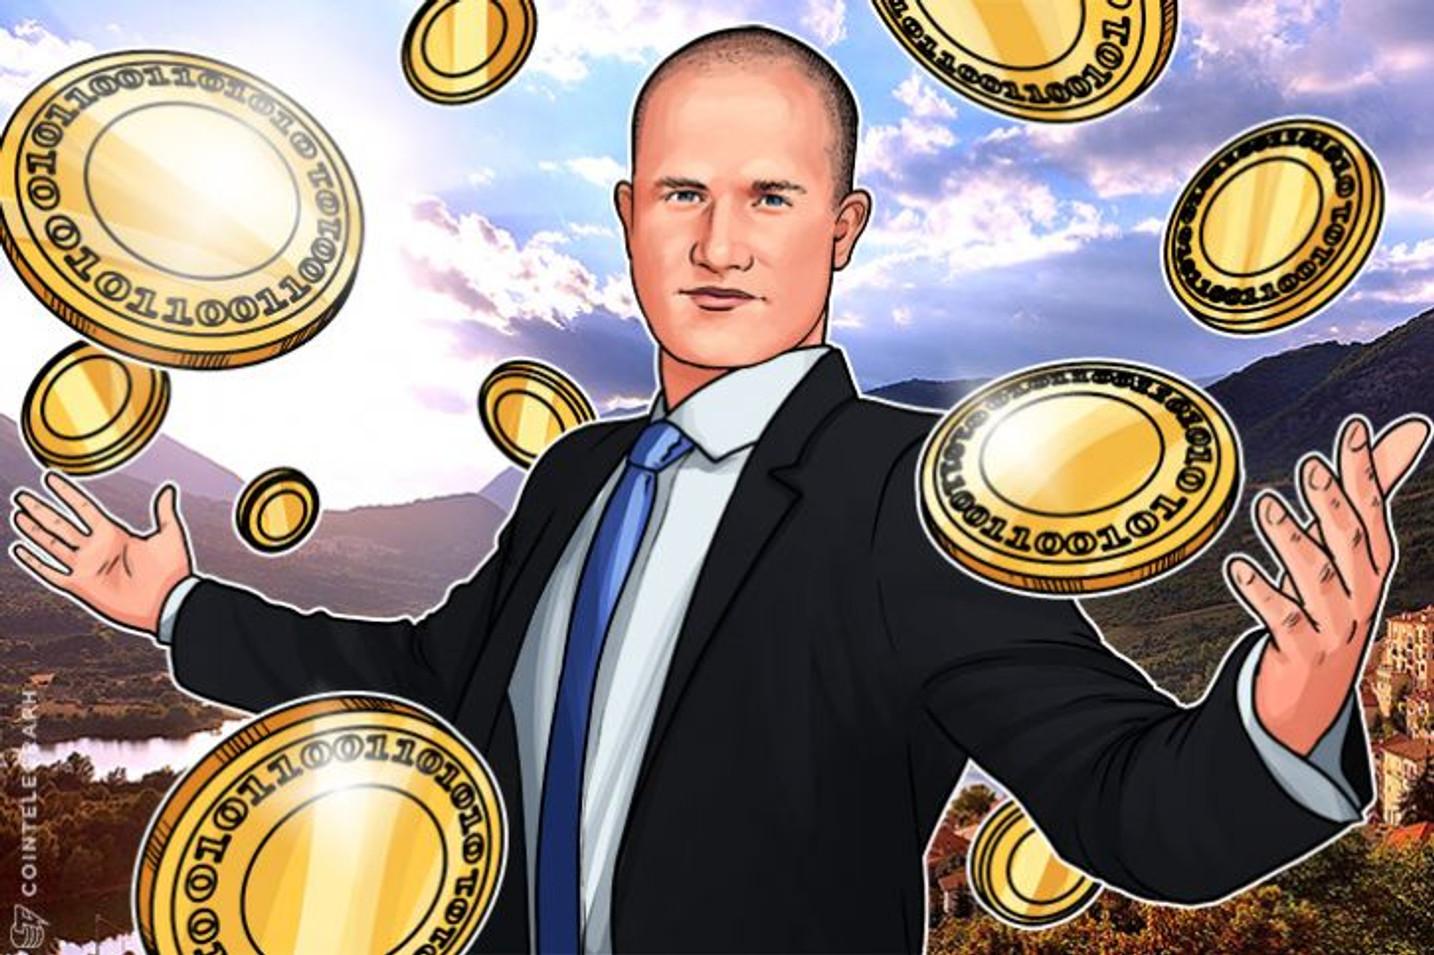 SegWait-a-Minute? Coinbase Appears To U-turn On Bitcoin Hard Fork